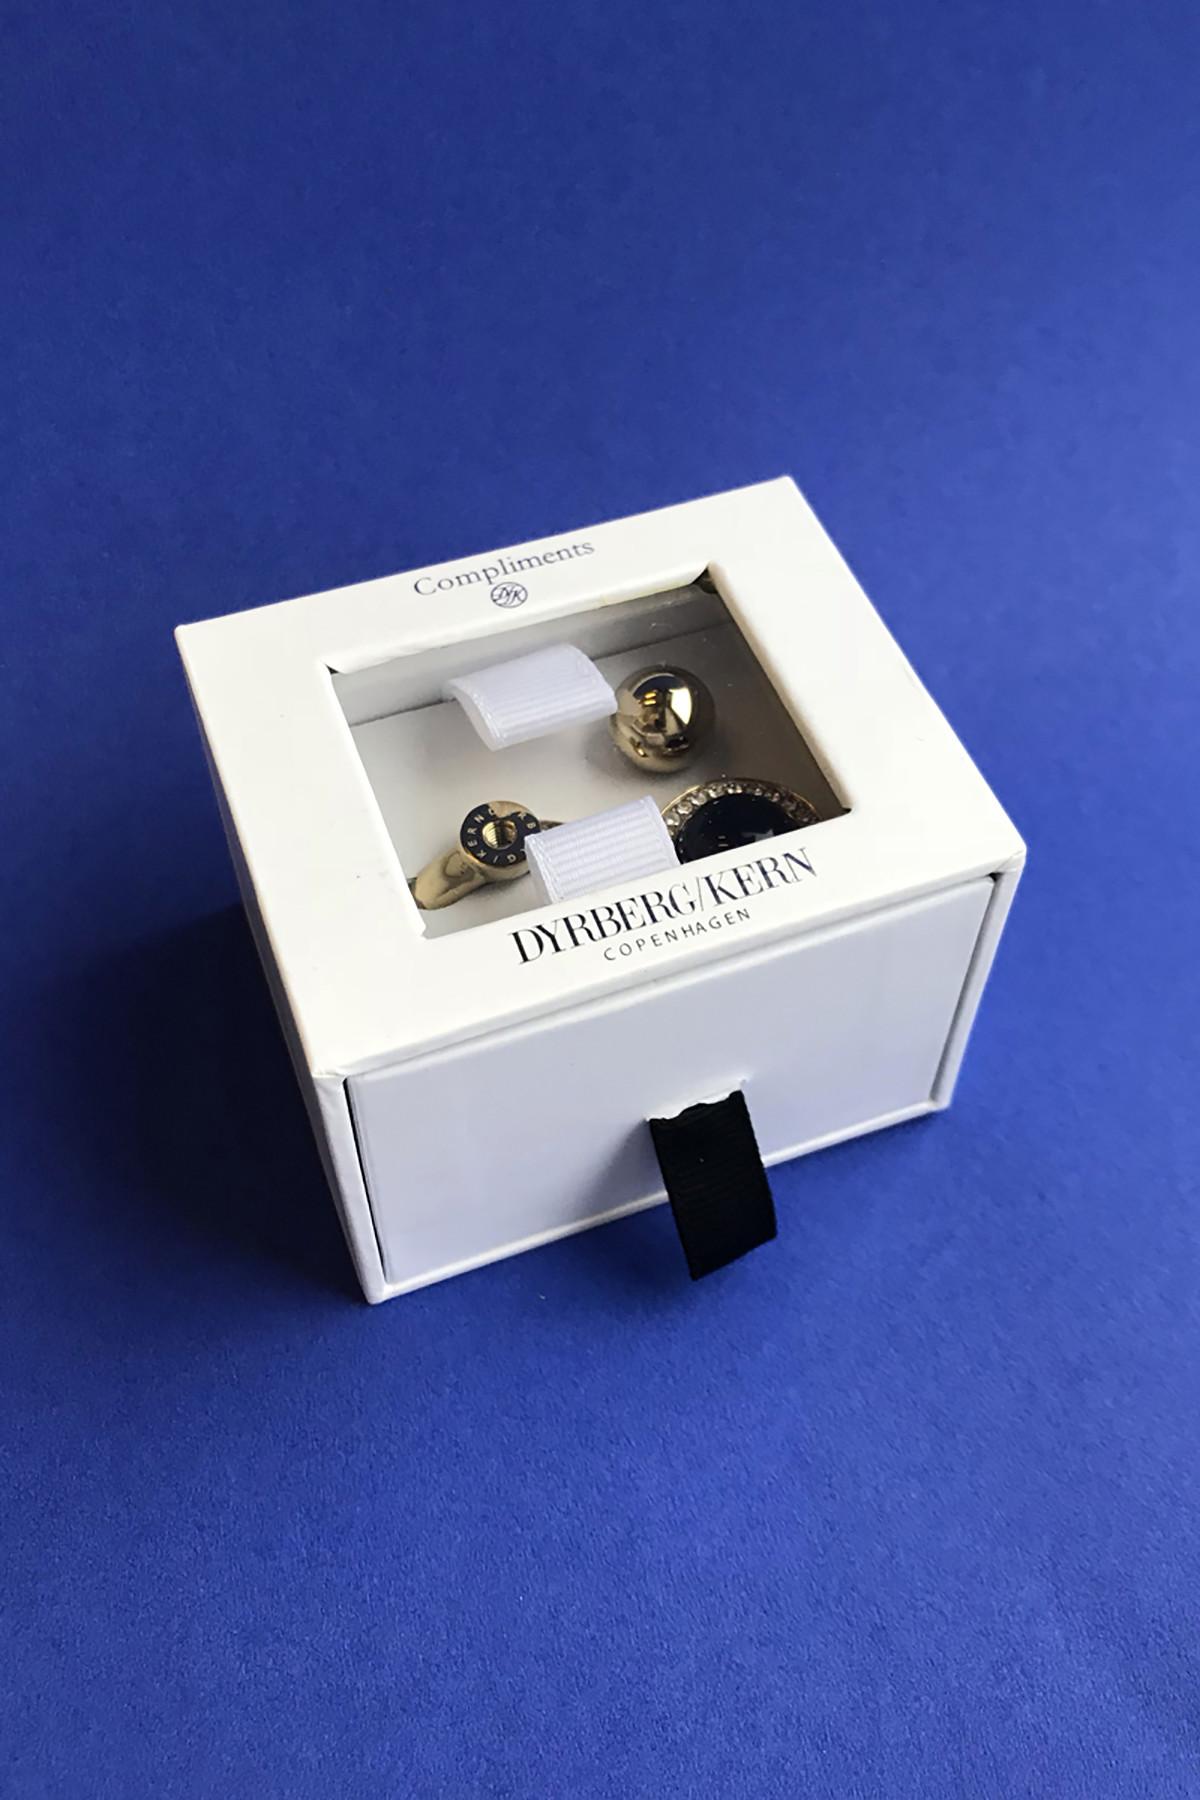 DYRBERG/KERN RDU COMPLIMENTS 3 SET 2 RING 350740